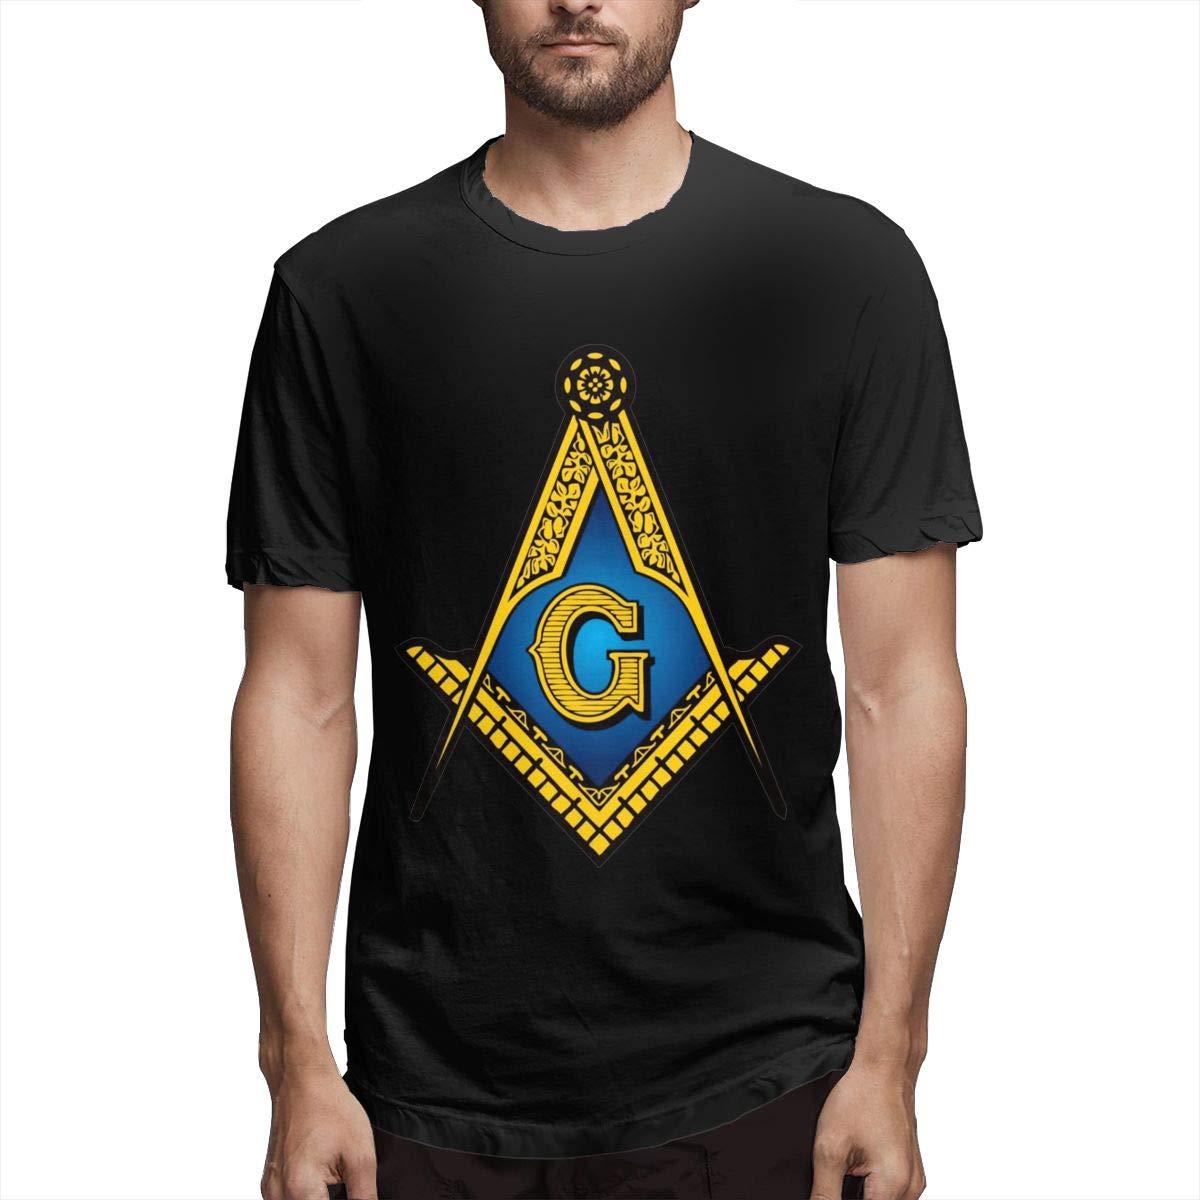 Marsherun Men Freemason Square and Compass Comfortable Short Sleeve Tee Shirt